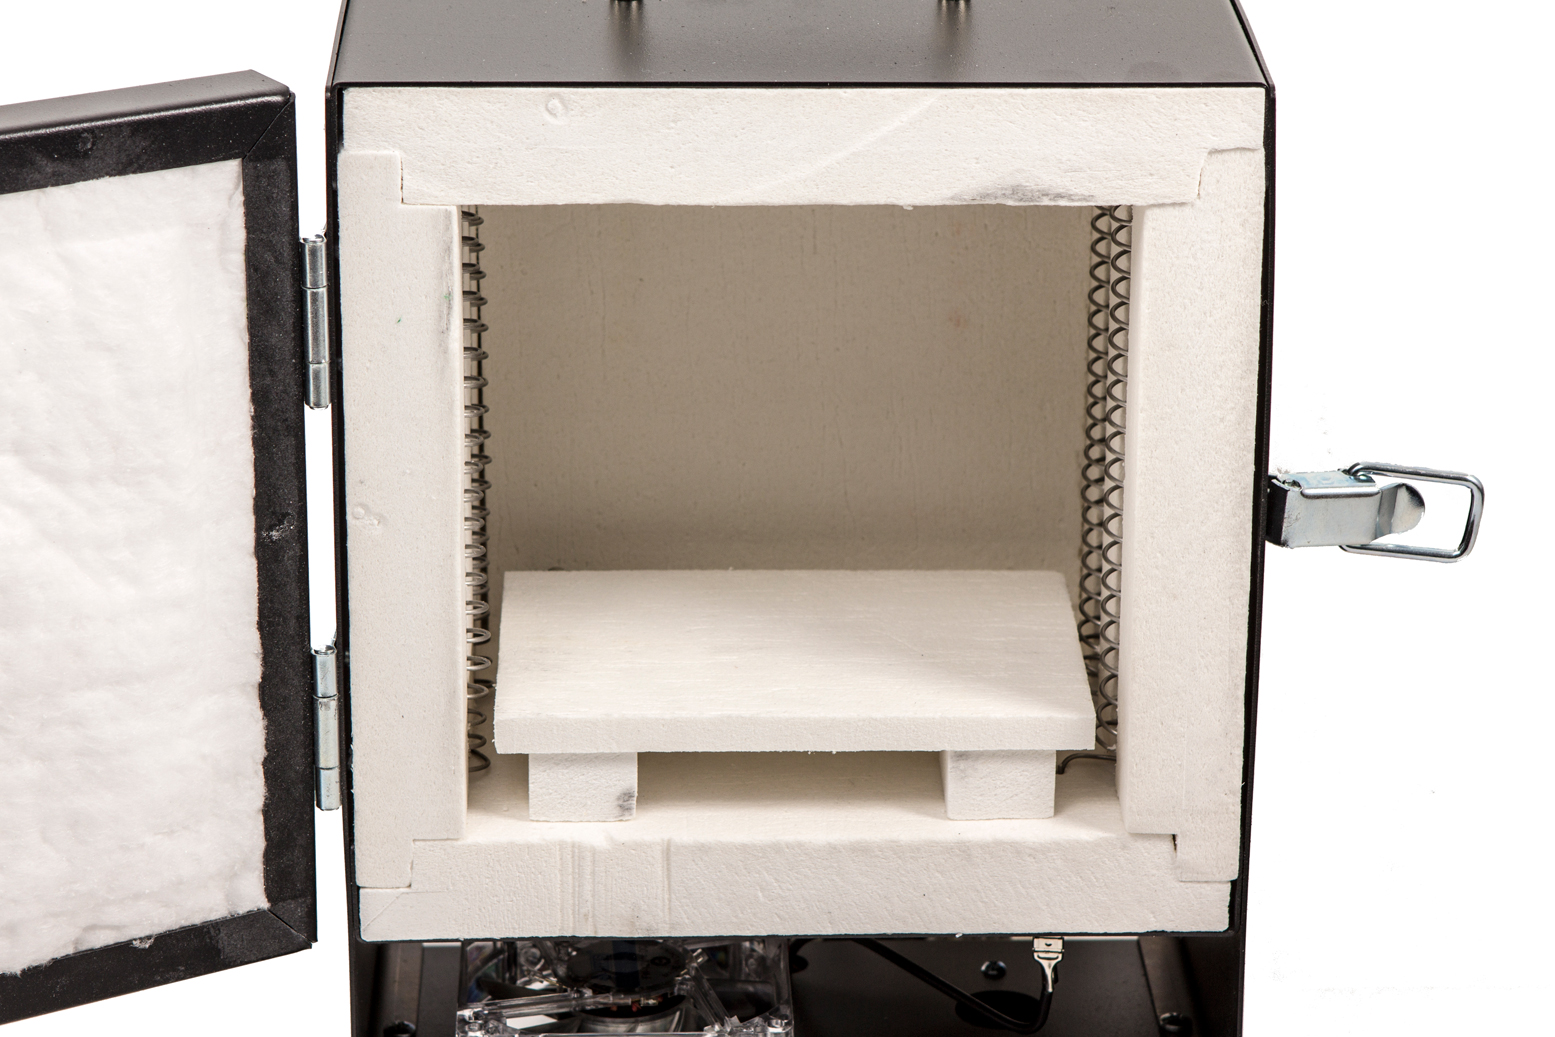 Rapidfire Pro Lp Electric Kiln Relay Quikmelt Front Loading Tabletop Furnace Company